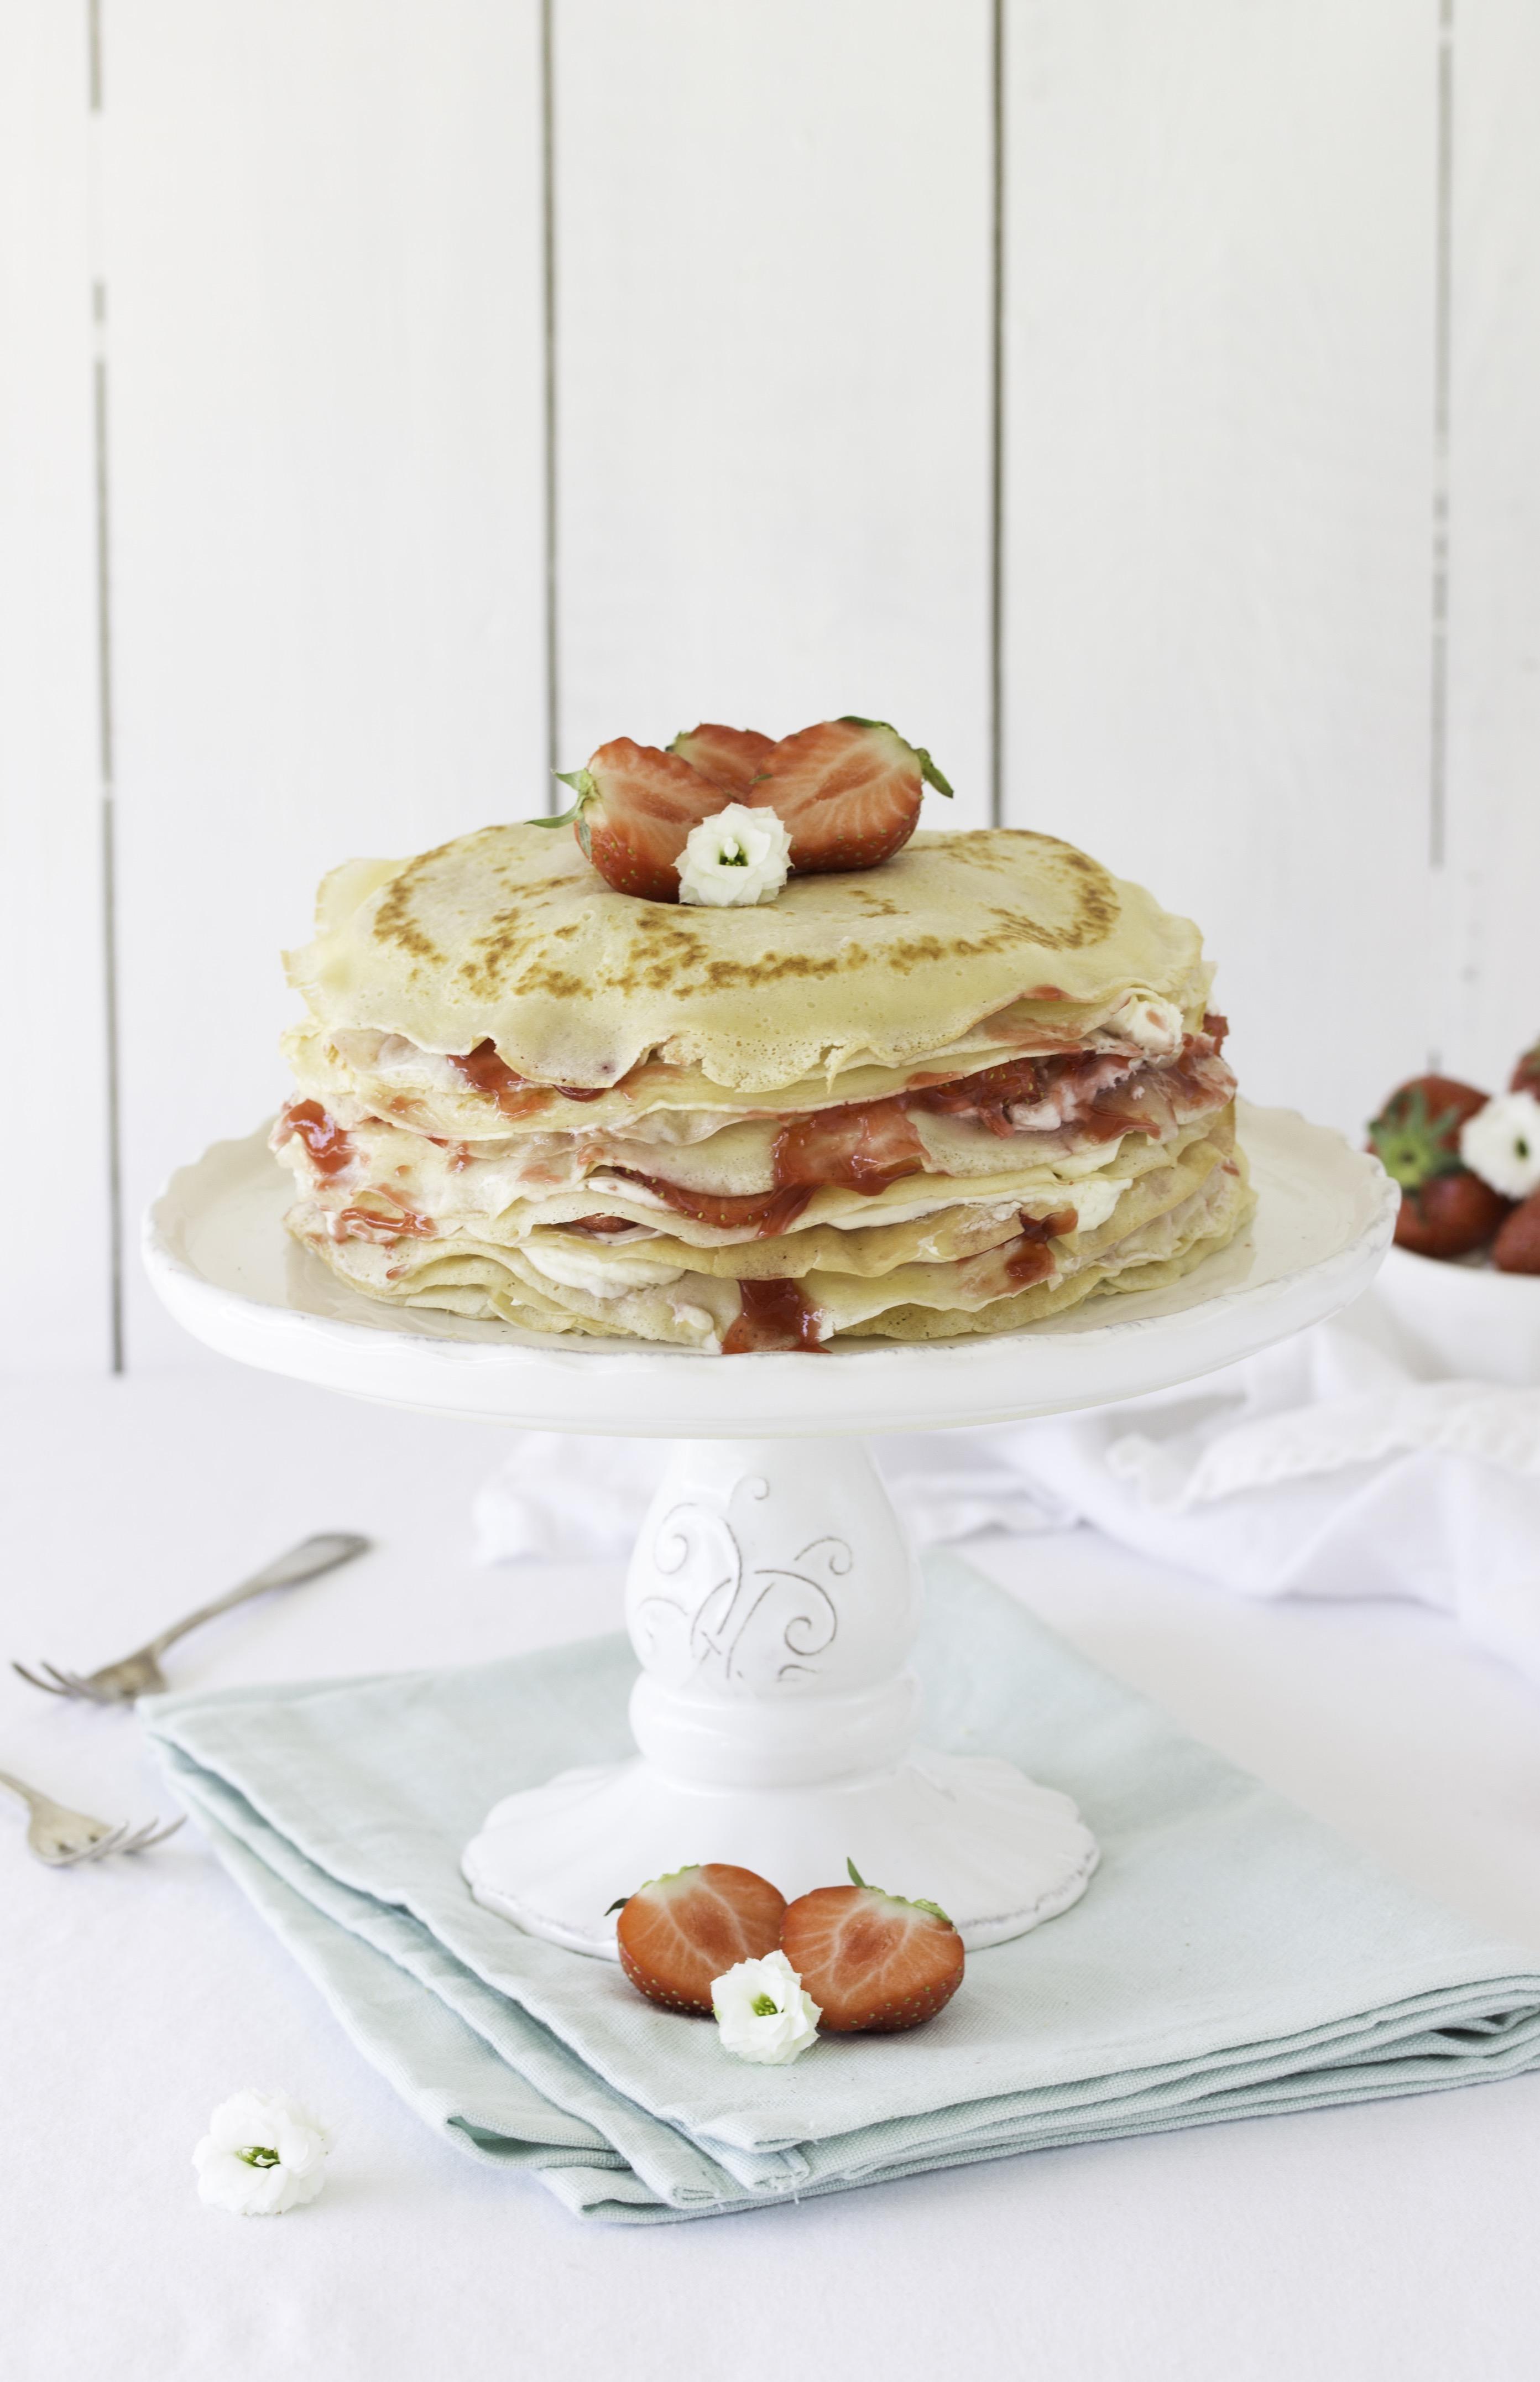 Schwartau - Crepe Cake - Smoothie-3.1